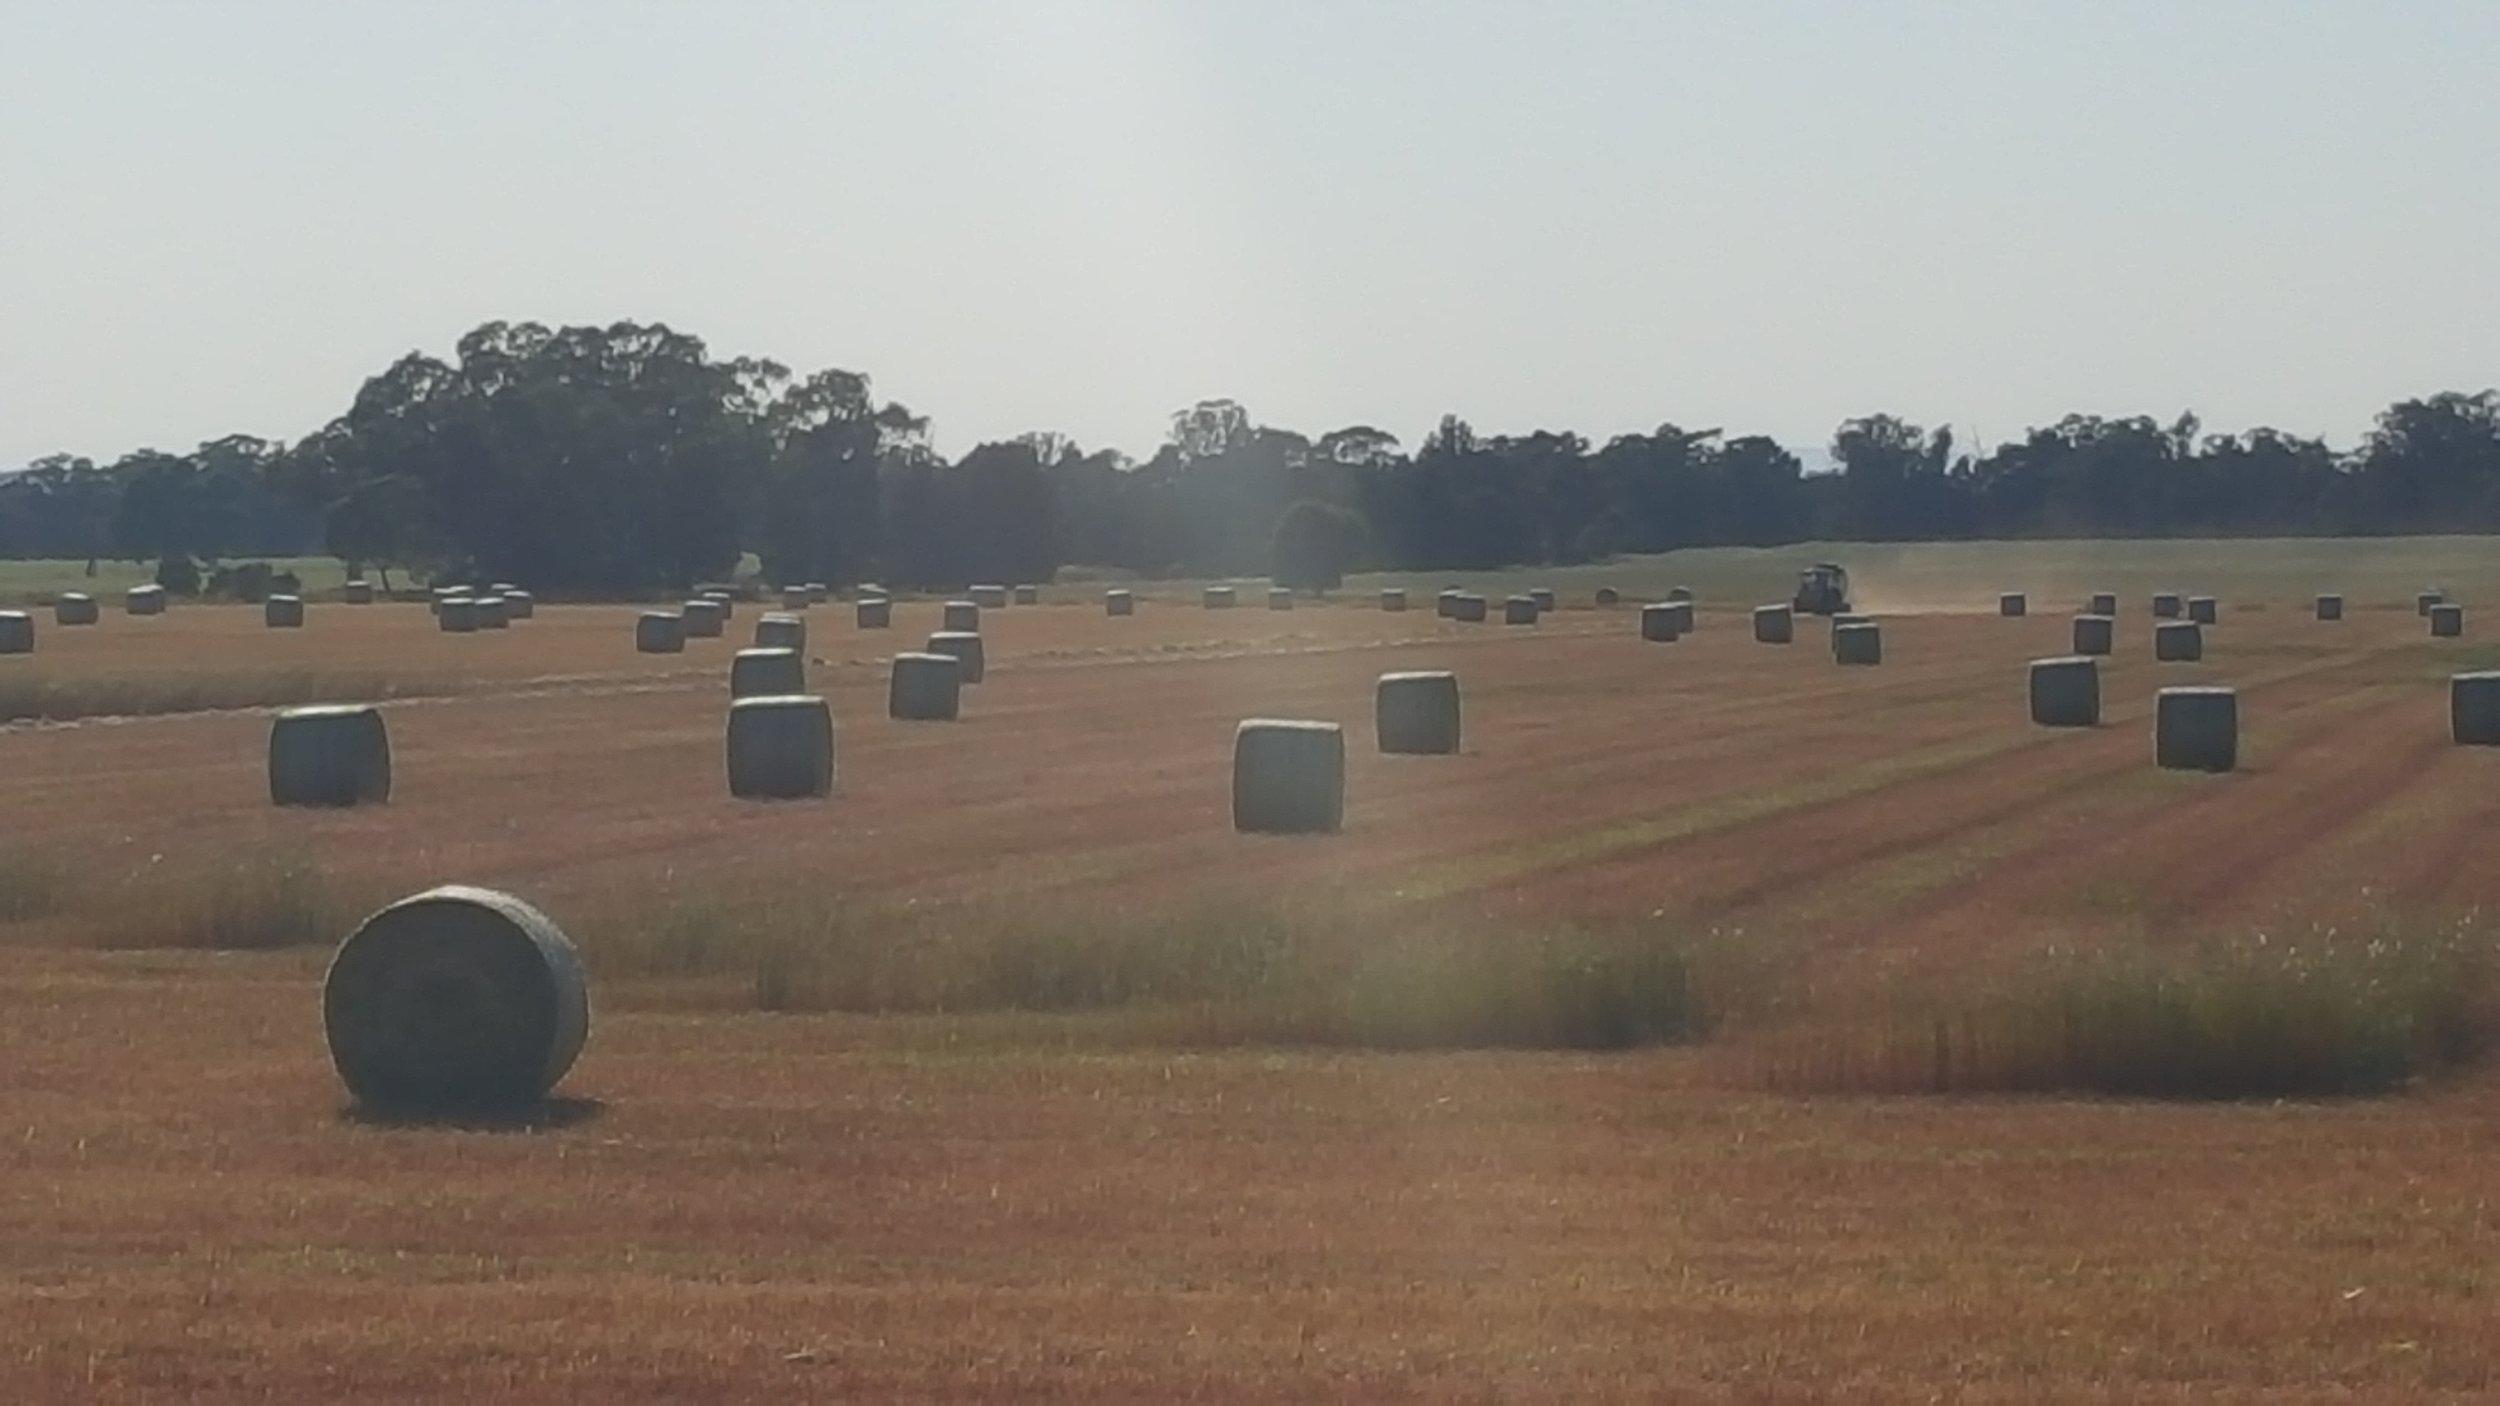 Visit My Farm Australia - Girraween, Tullamore NSW